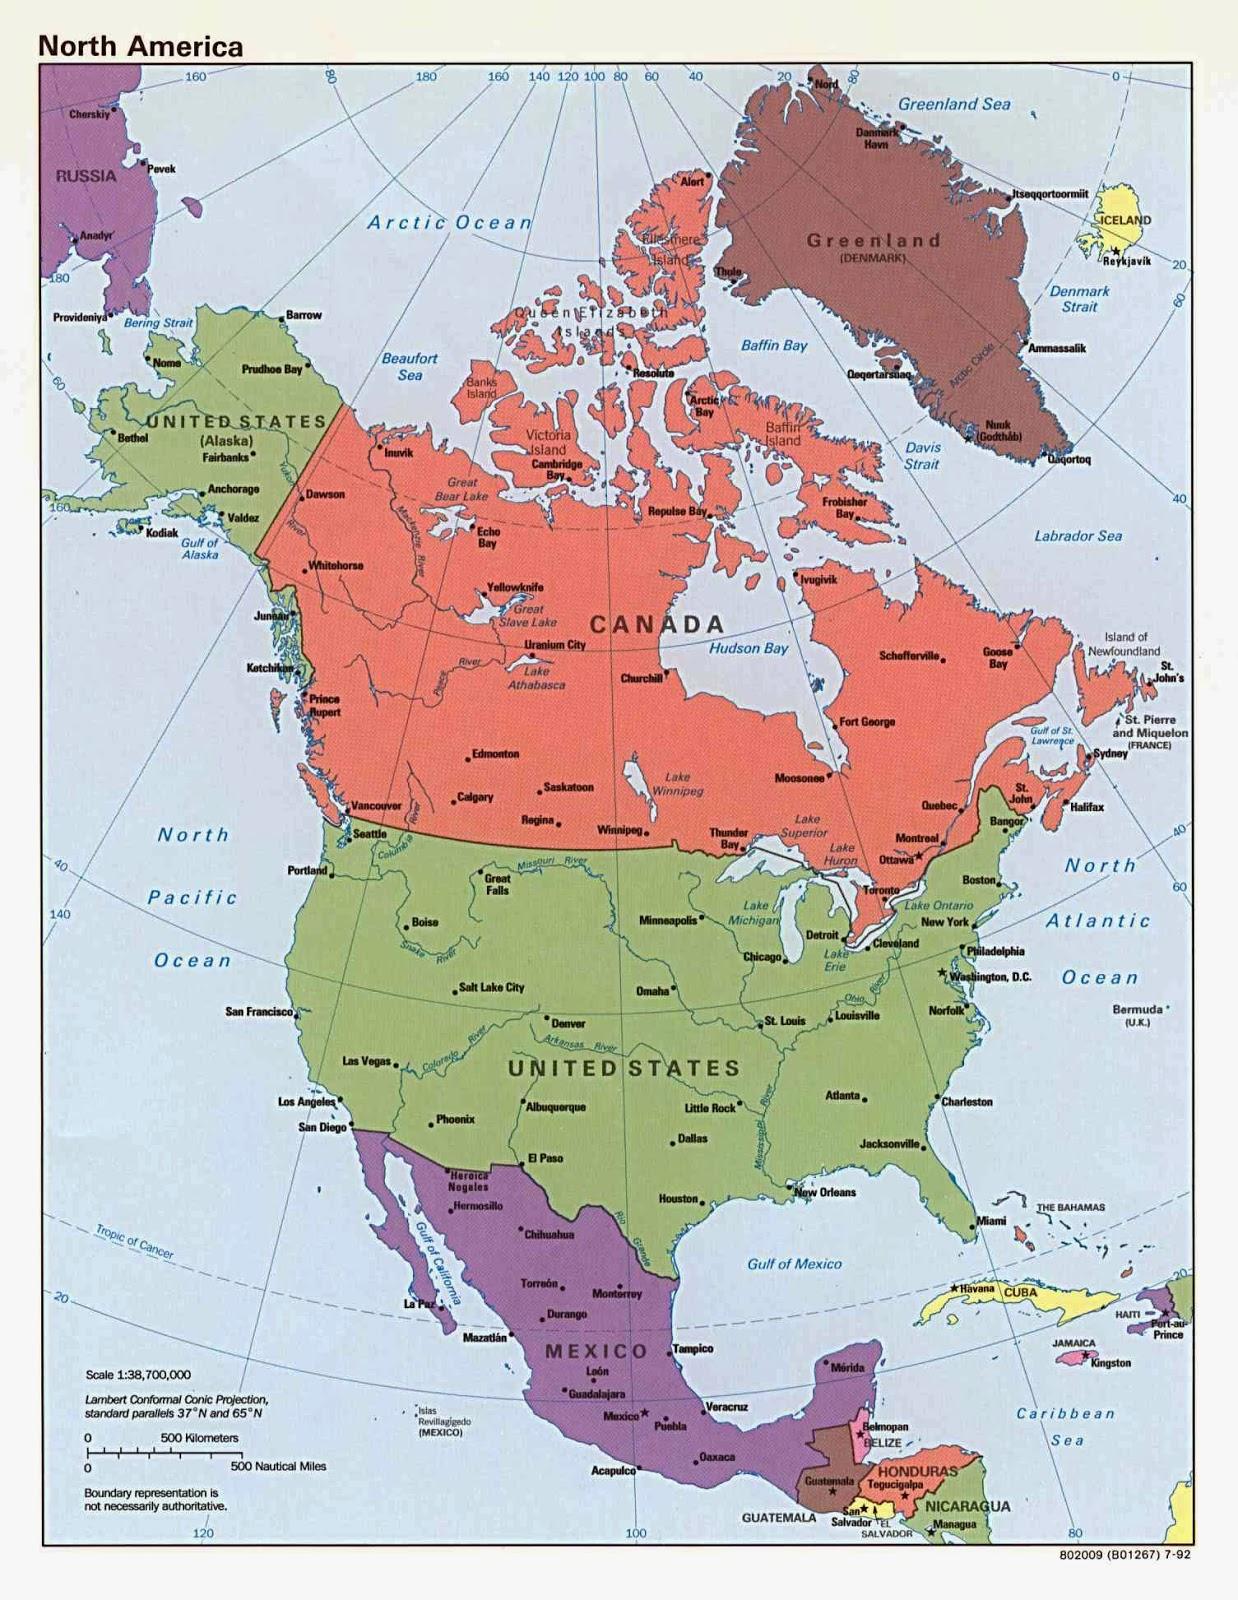 USA Map HD Wallpaper WallpaperSafari - Map of united states download